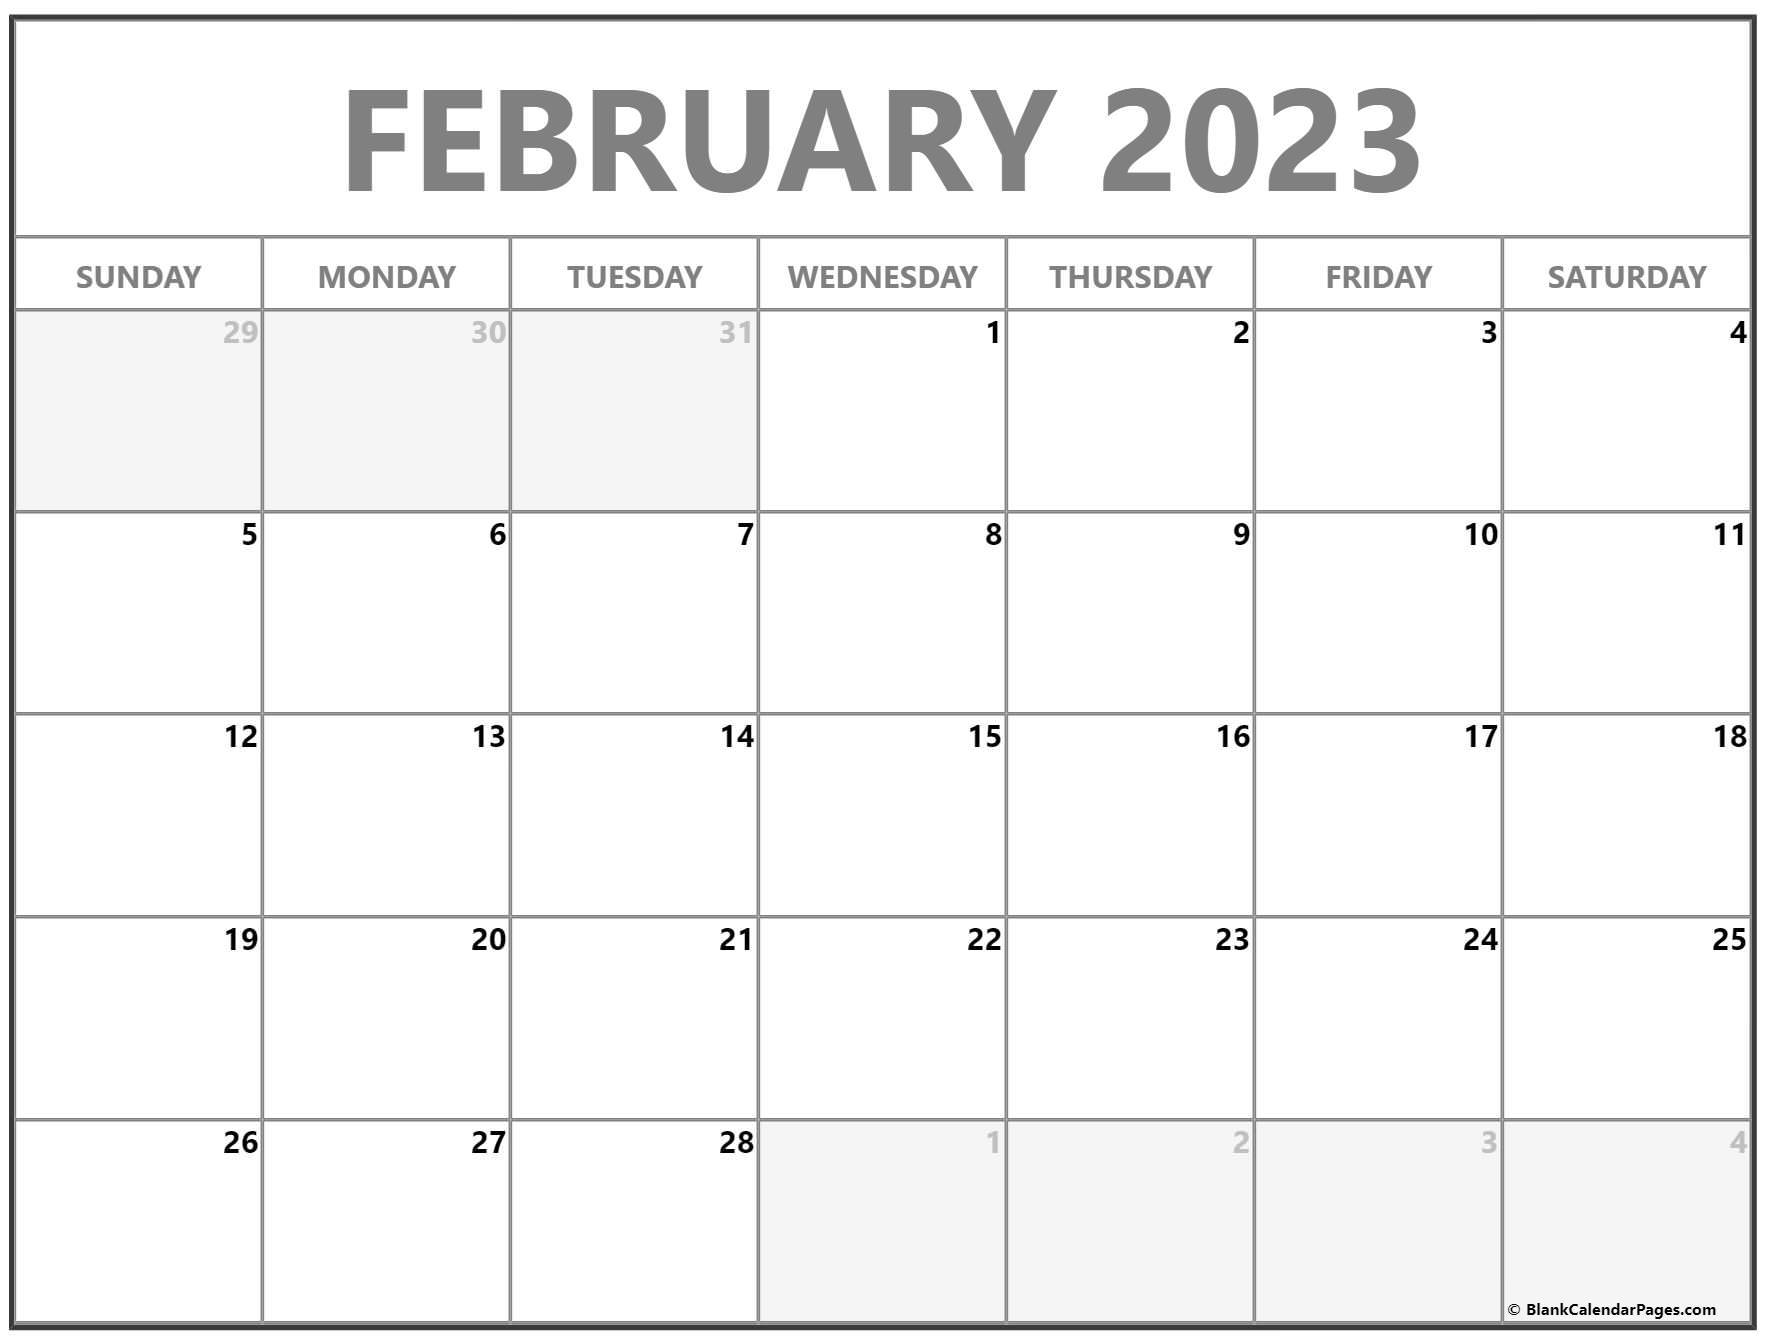 February 2022 calendar | free printable monthly calendars